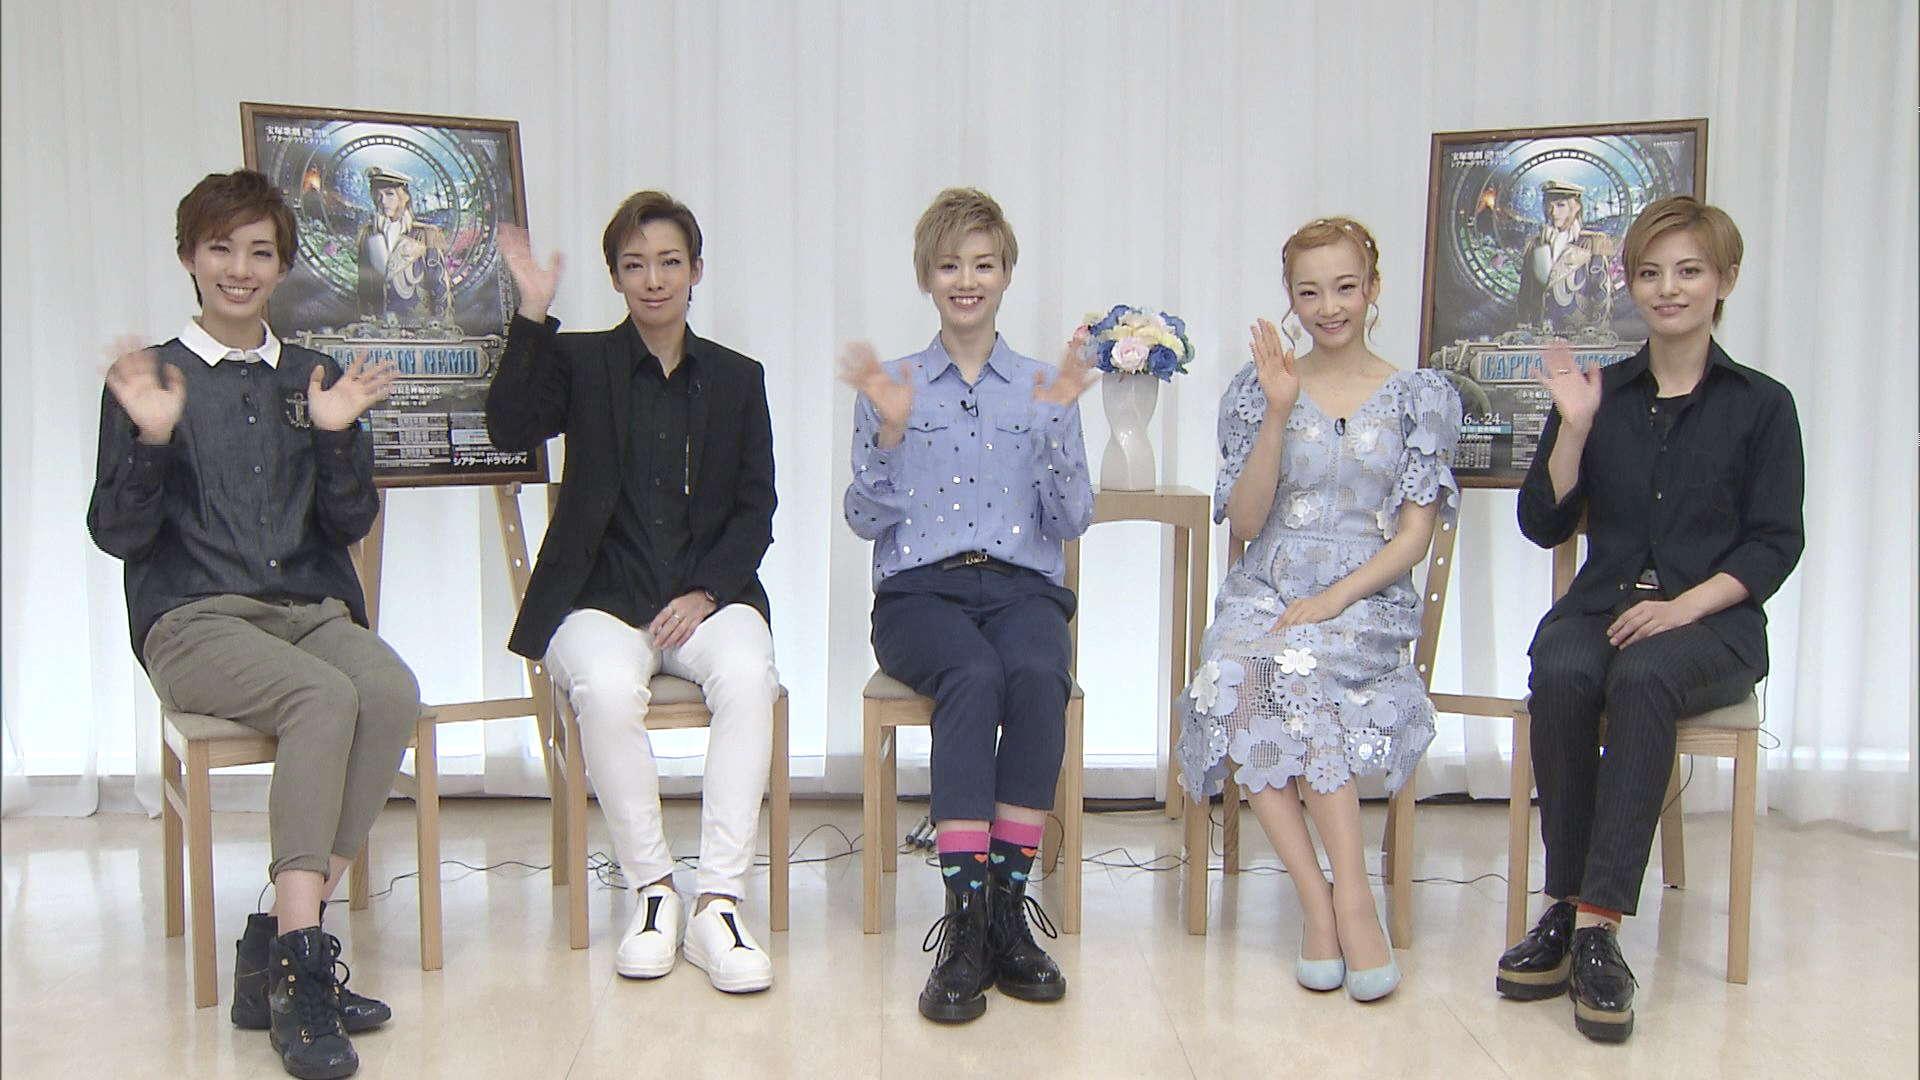 NOW ON STAGE 雪組日本青年館・シアター・ドラマシティ公演『CAPTAIN NEMO』